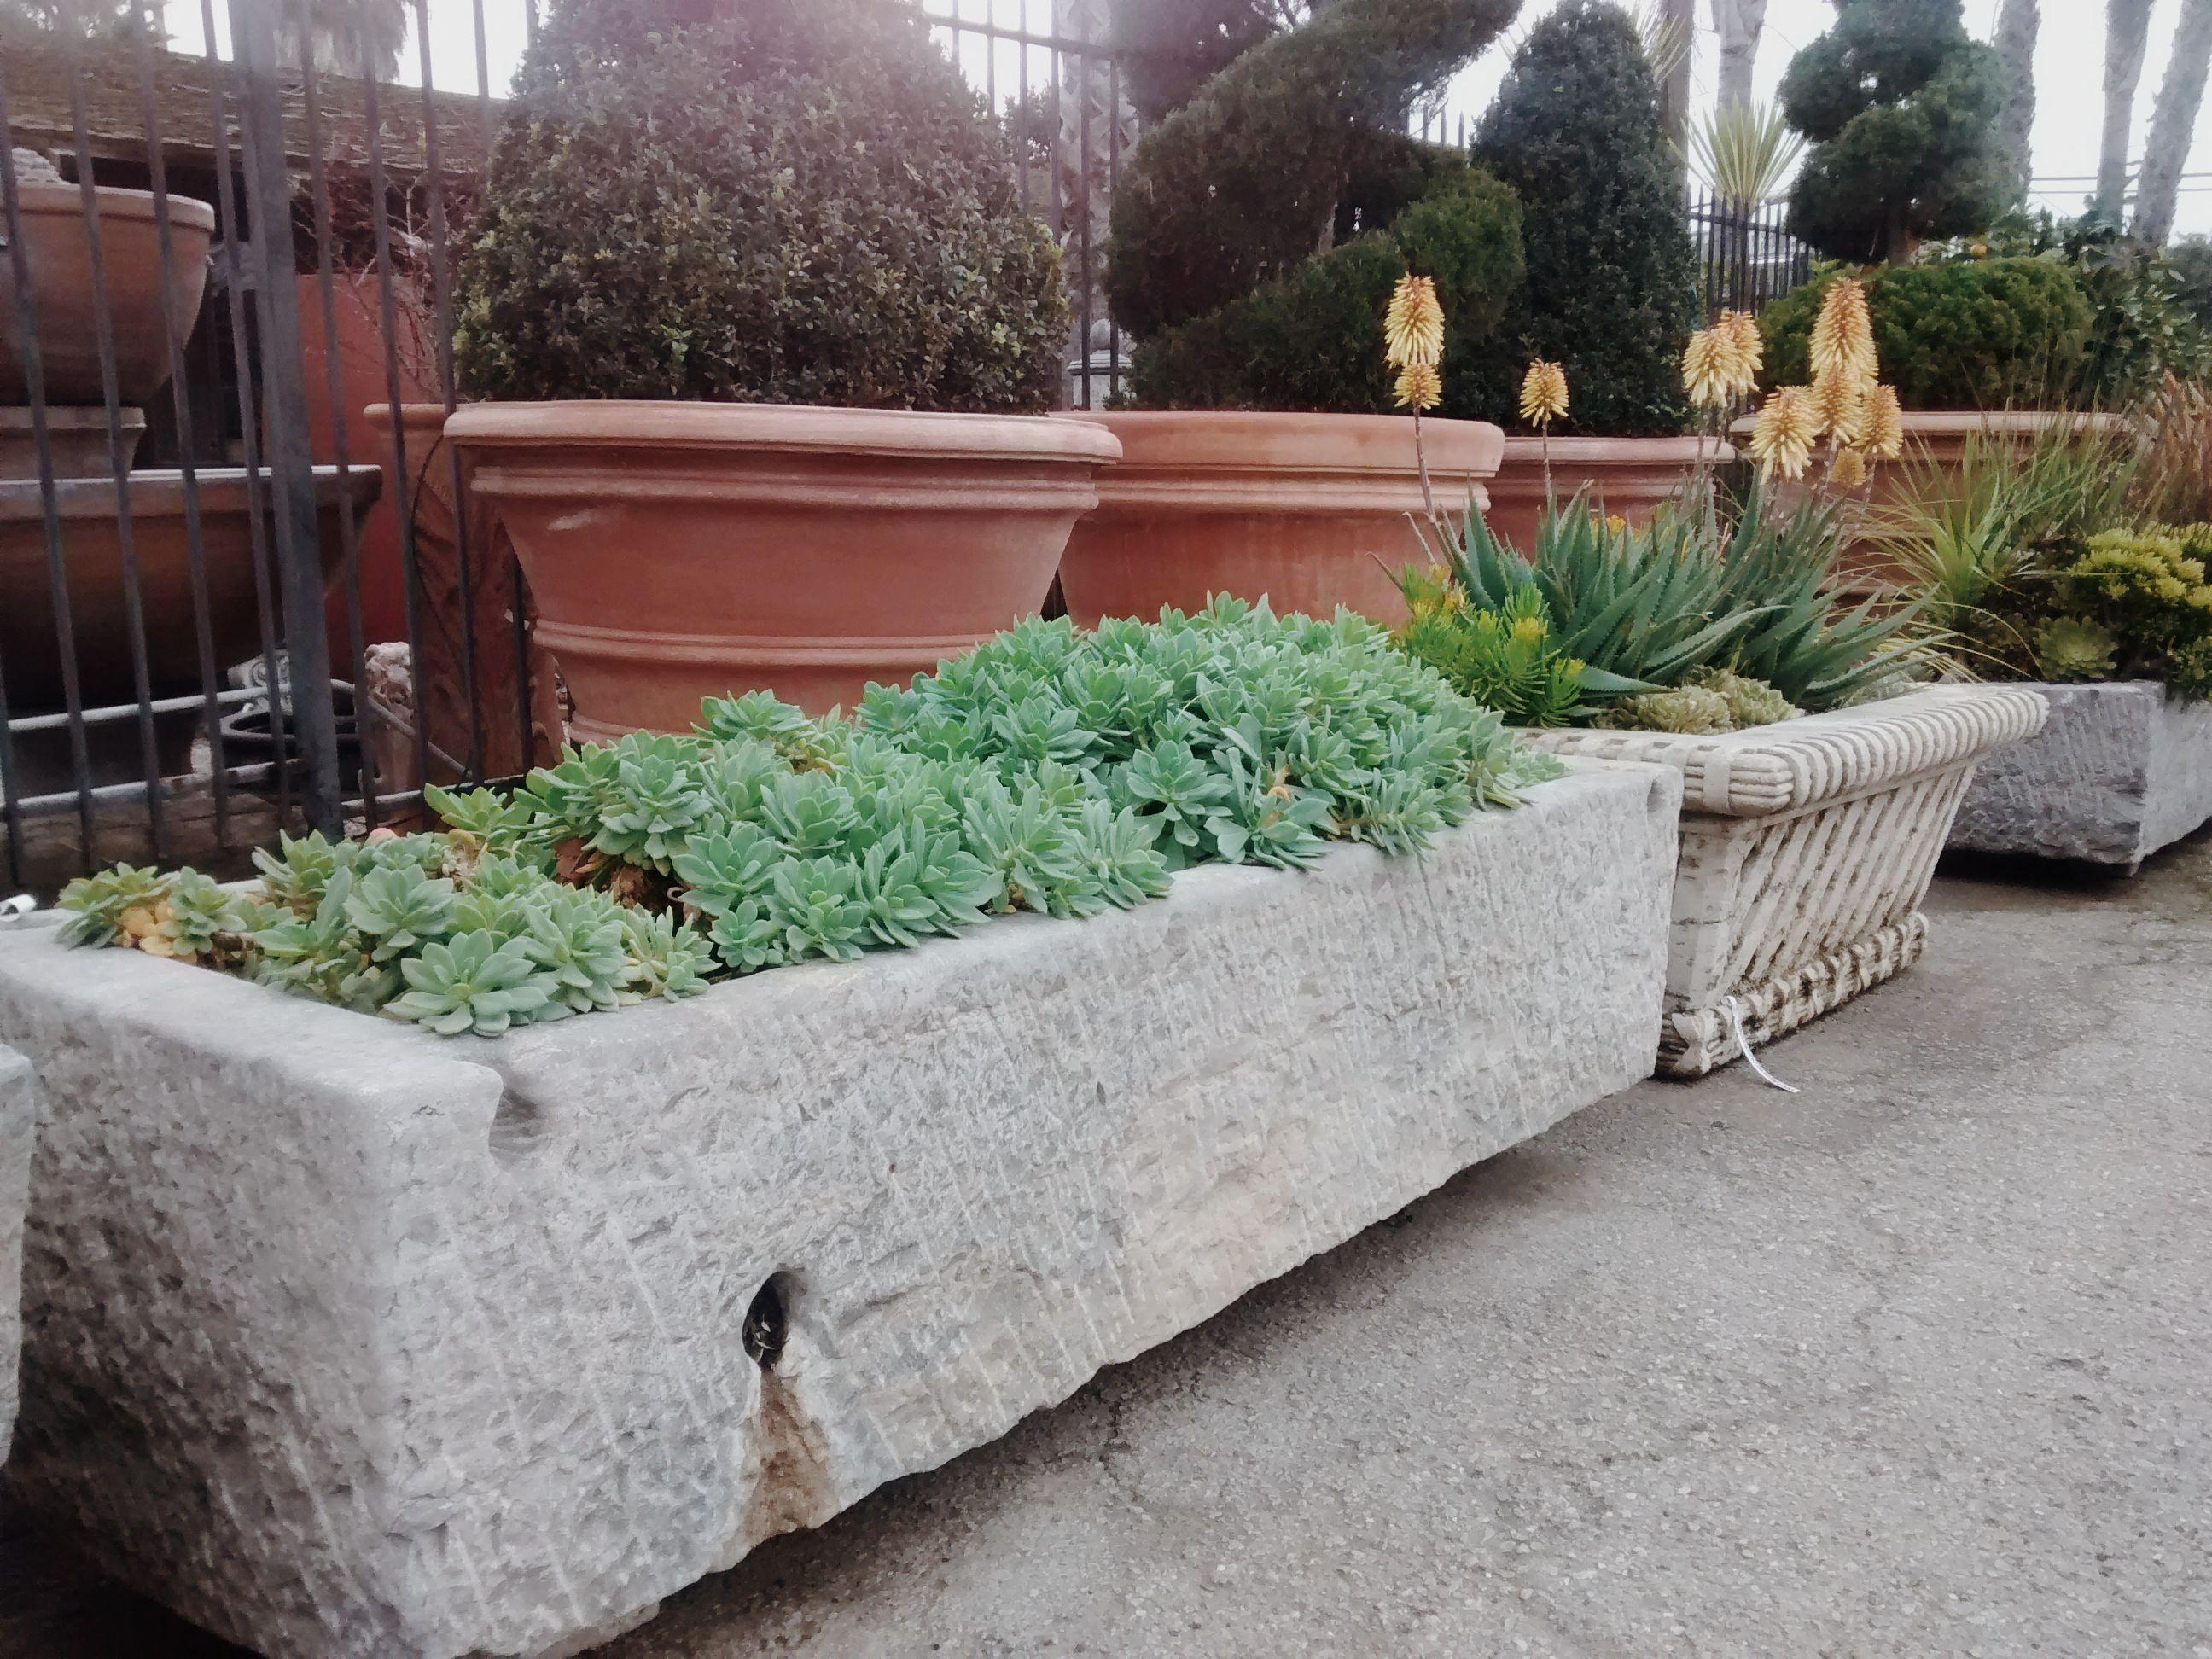 Fullsize Of Herb Garden Trough